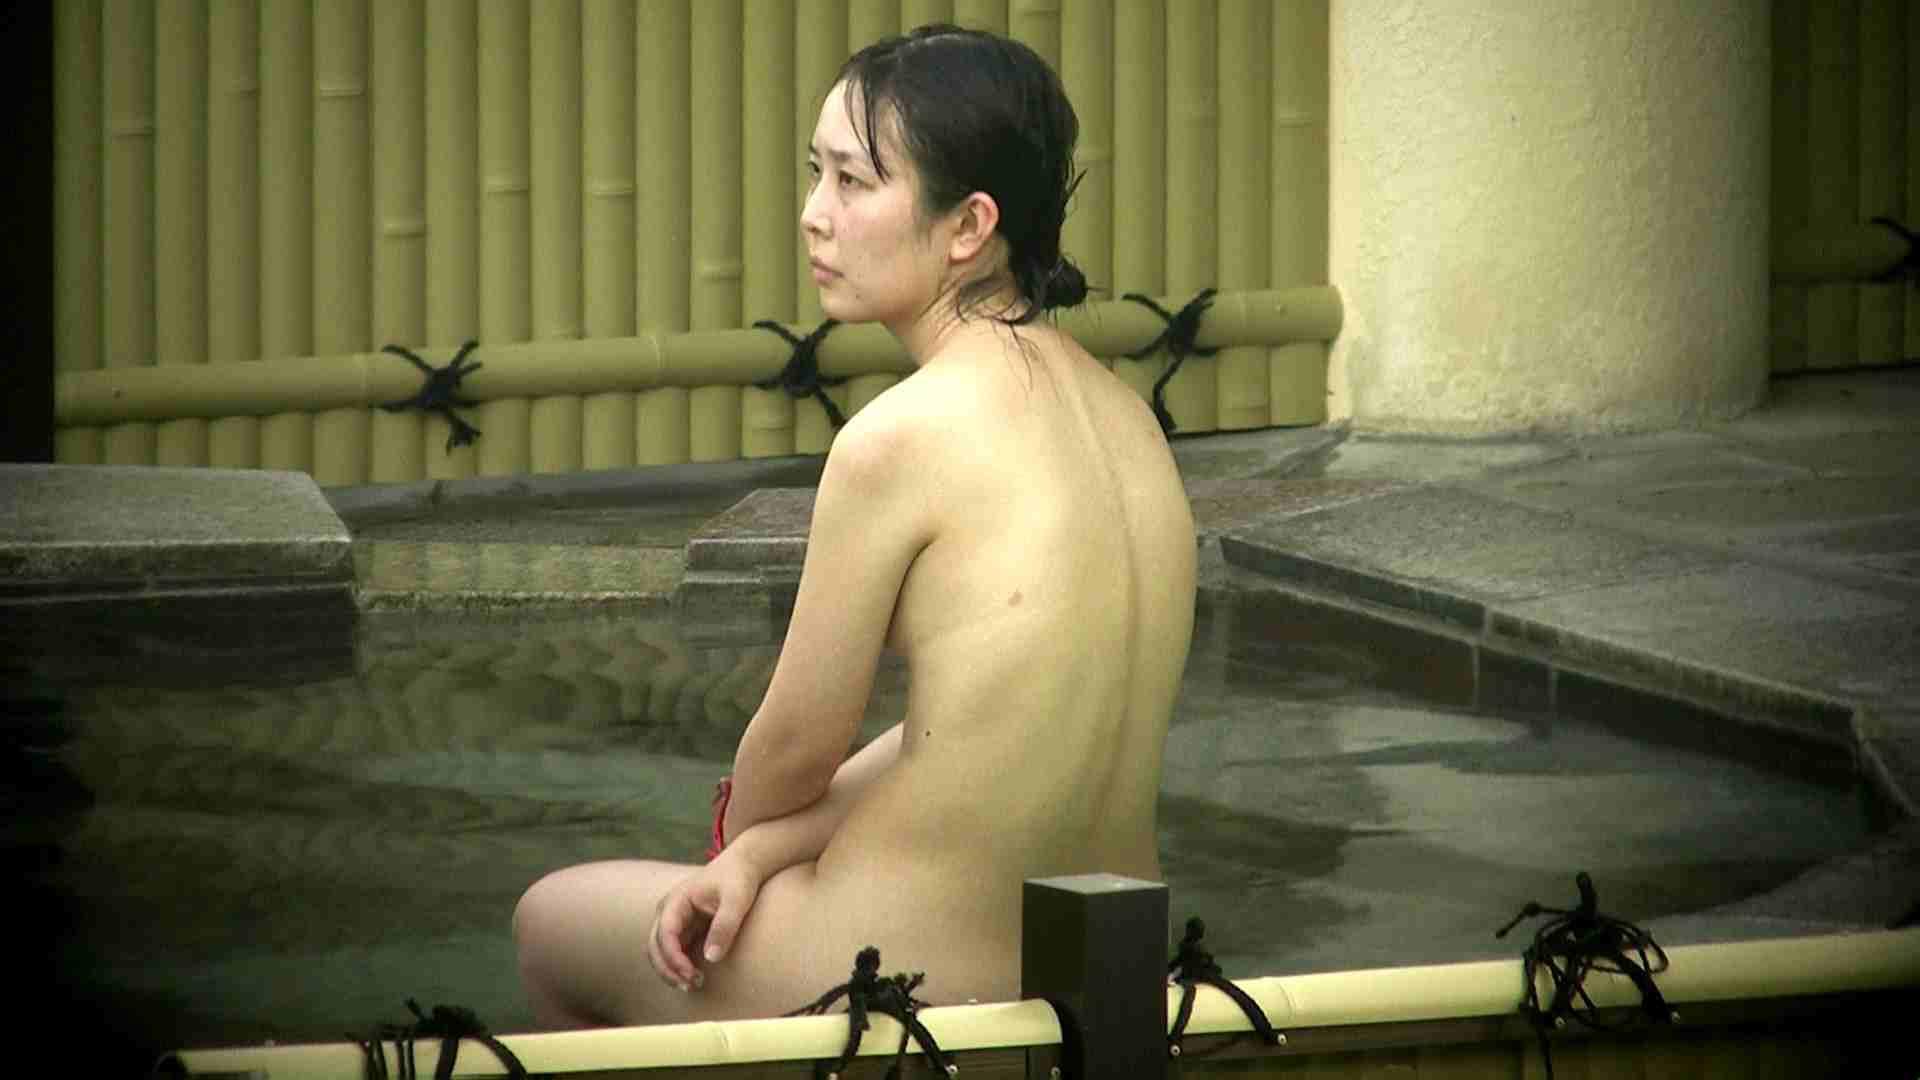 Aquaな露天風呂Vol.635 露天風呂編  77PIX 8